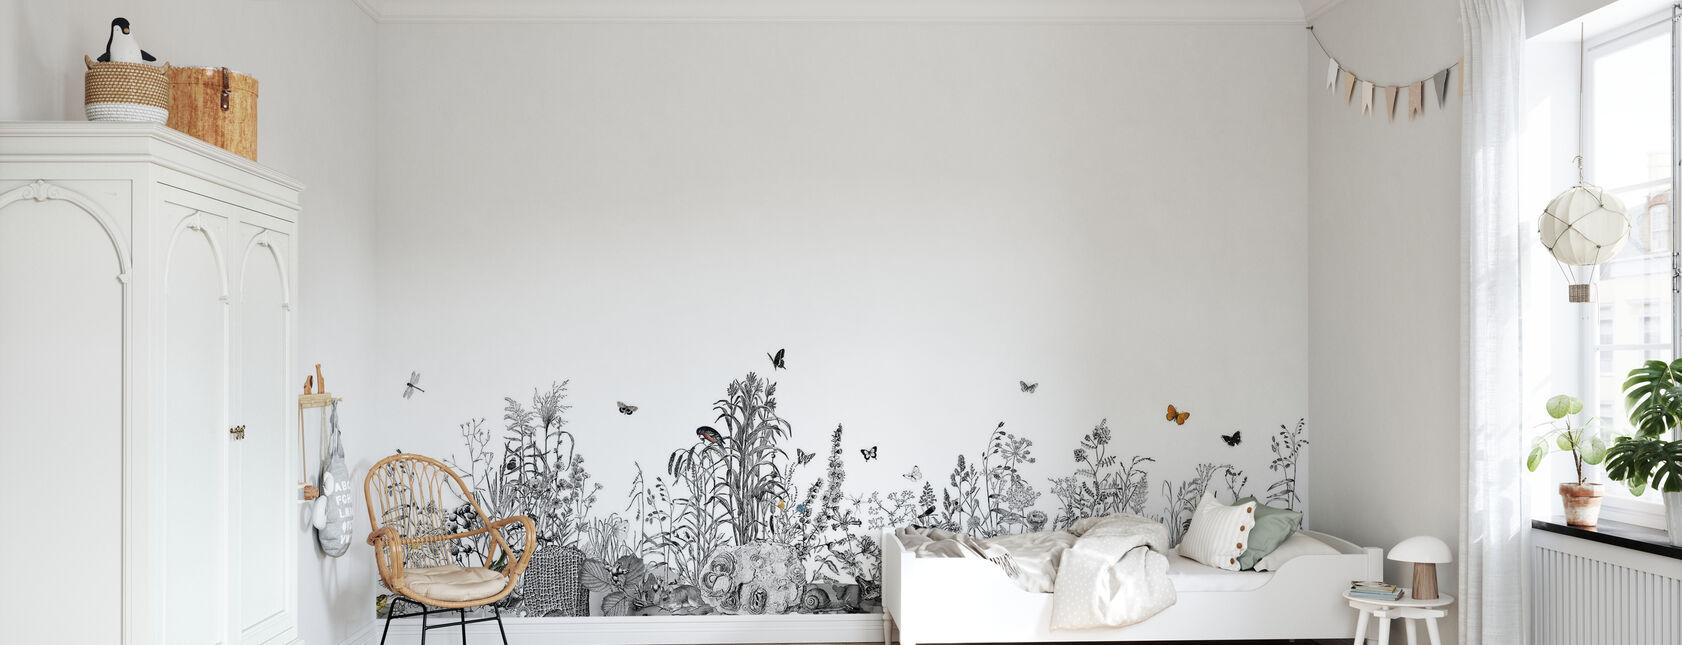 Snail Trail - Wallpaper - Kids Room